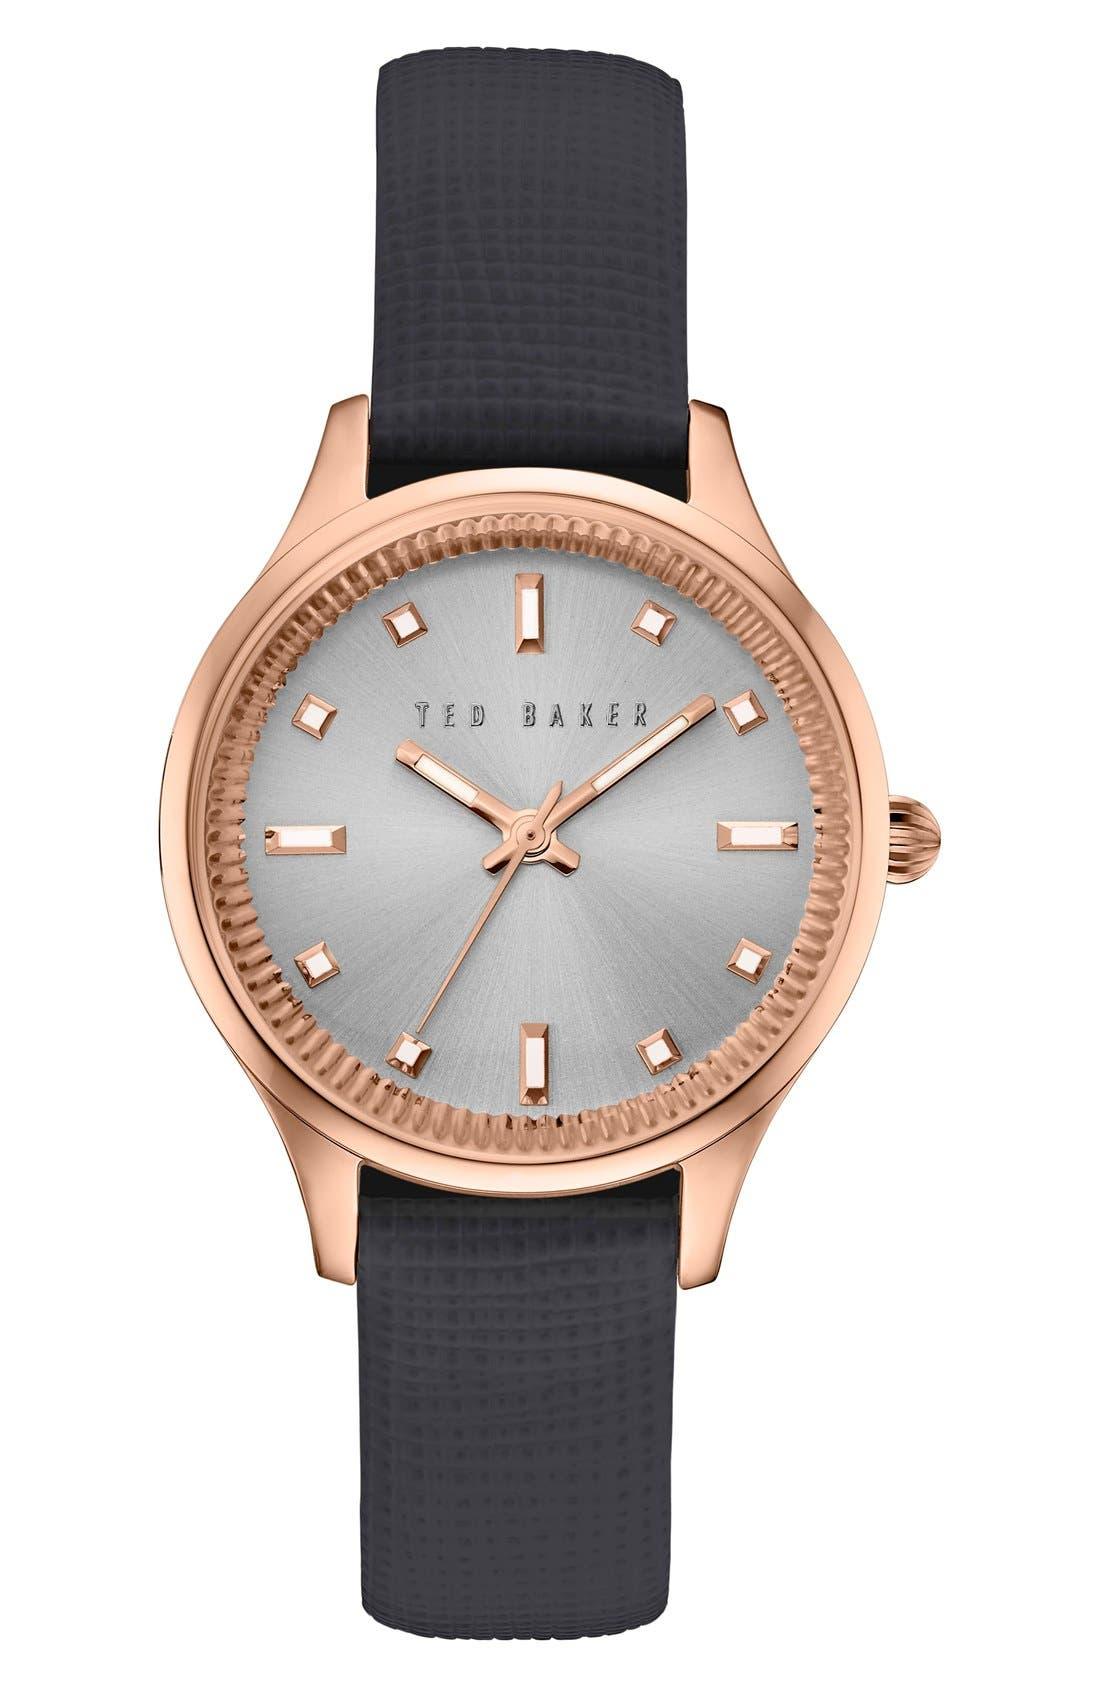 Ted Baker London 'Dress Sport' Multifunction Leather Strap Watch, 32mm